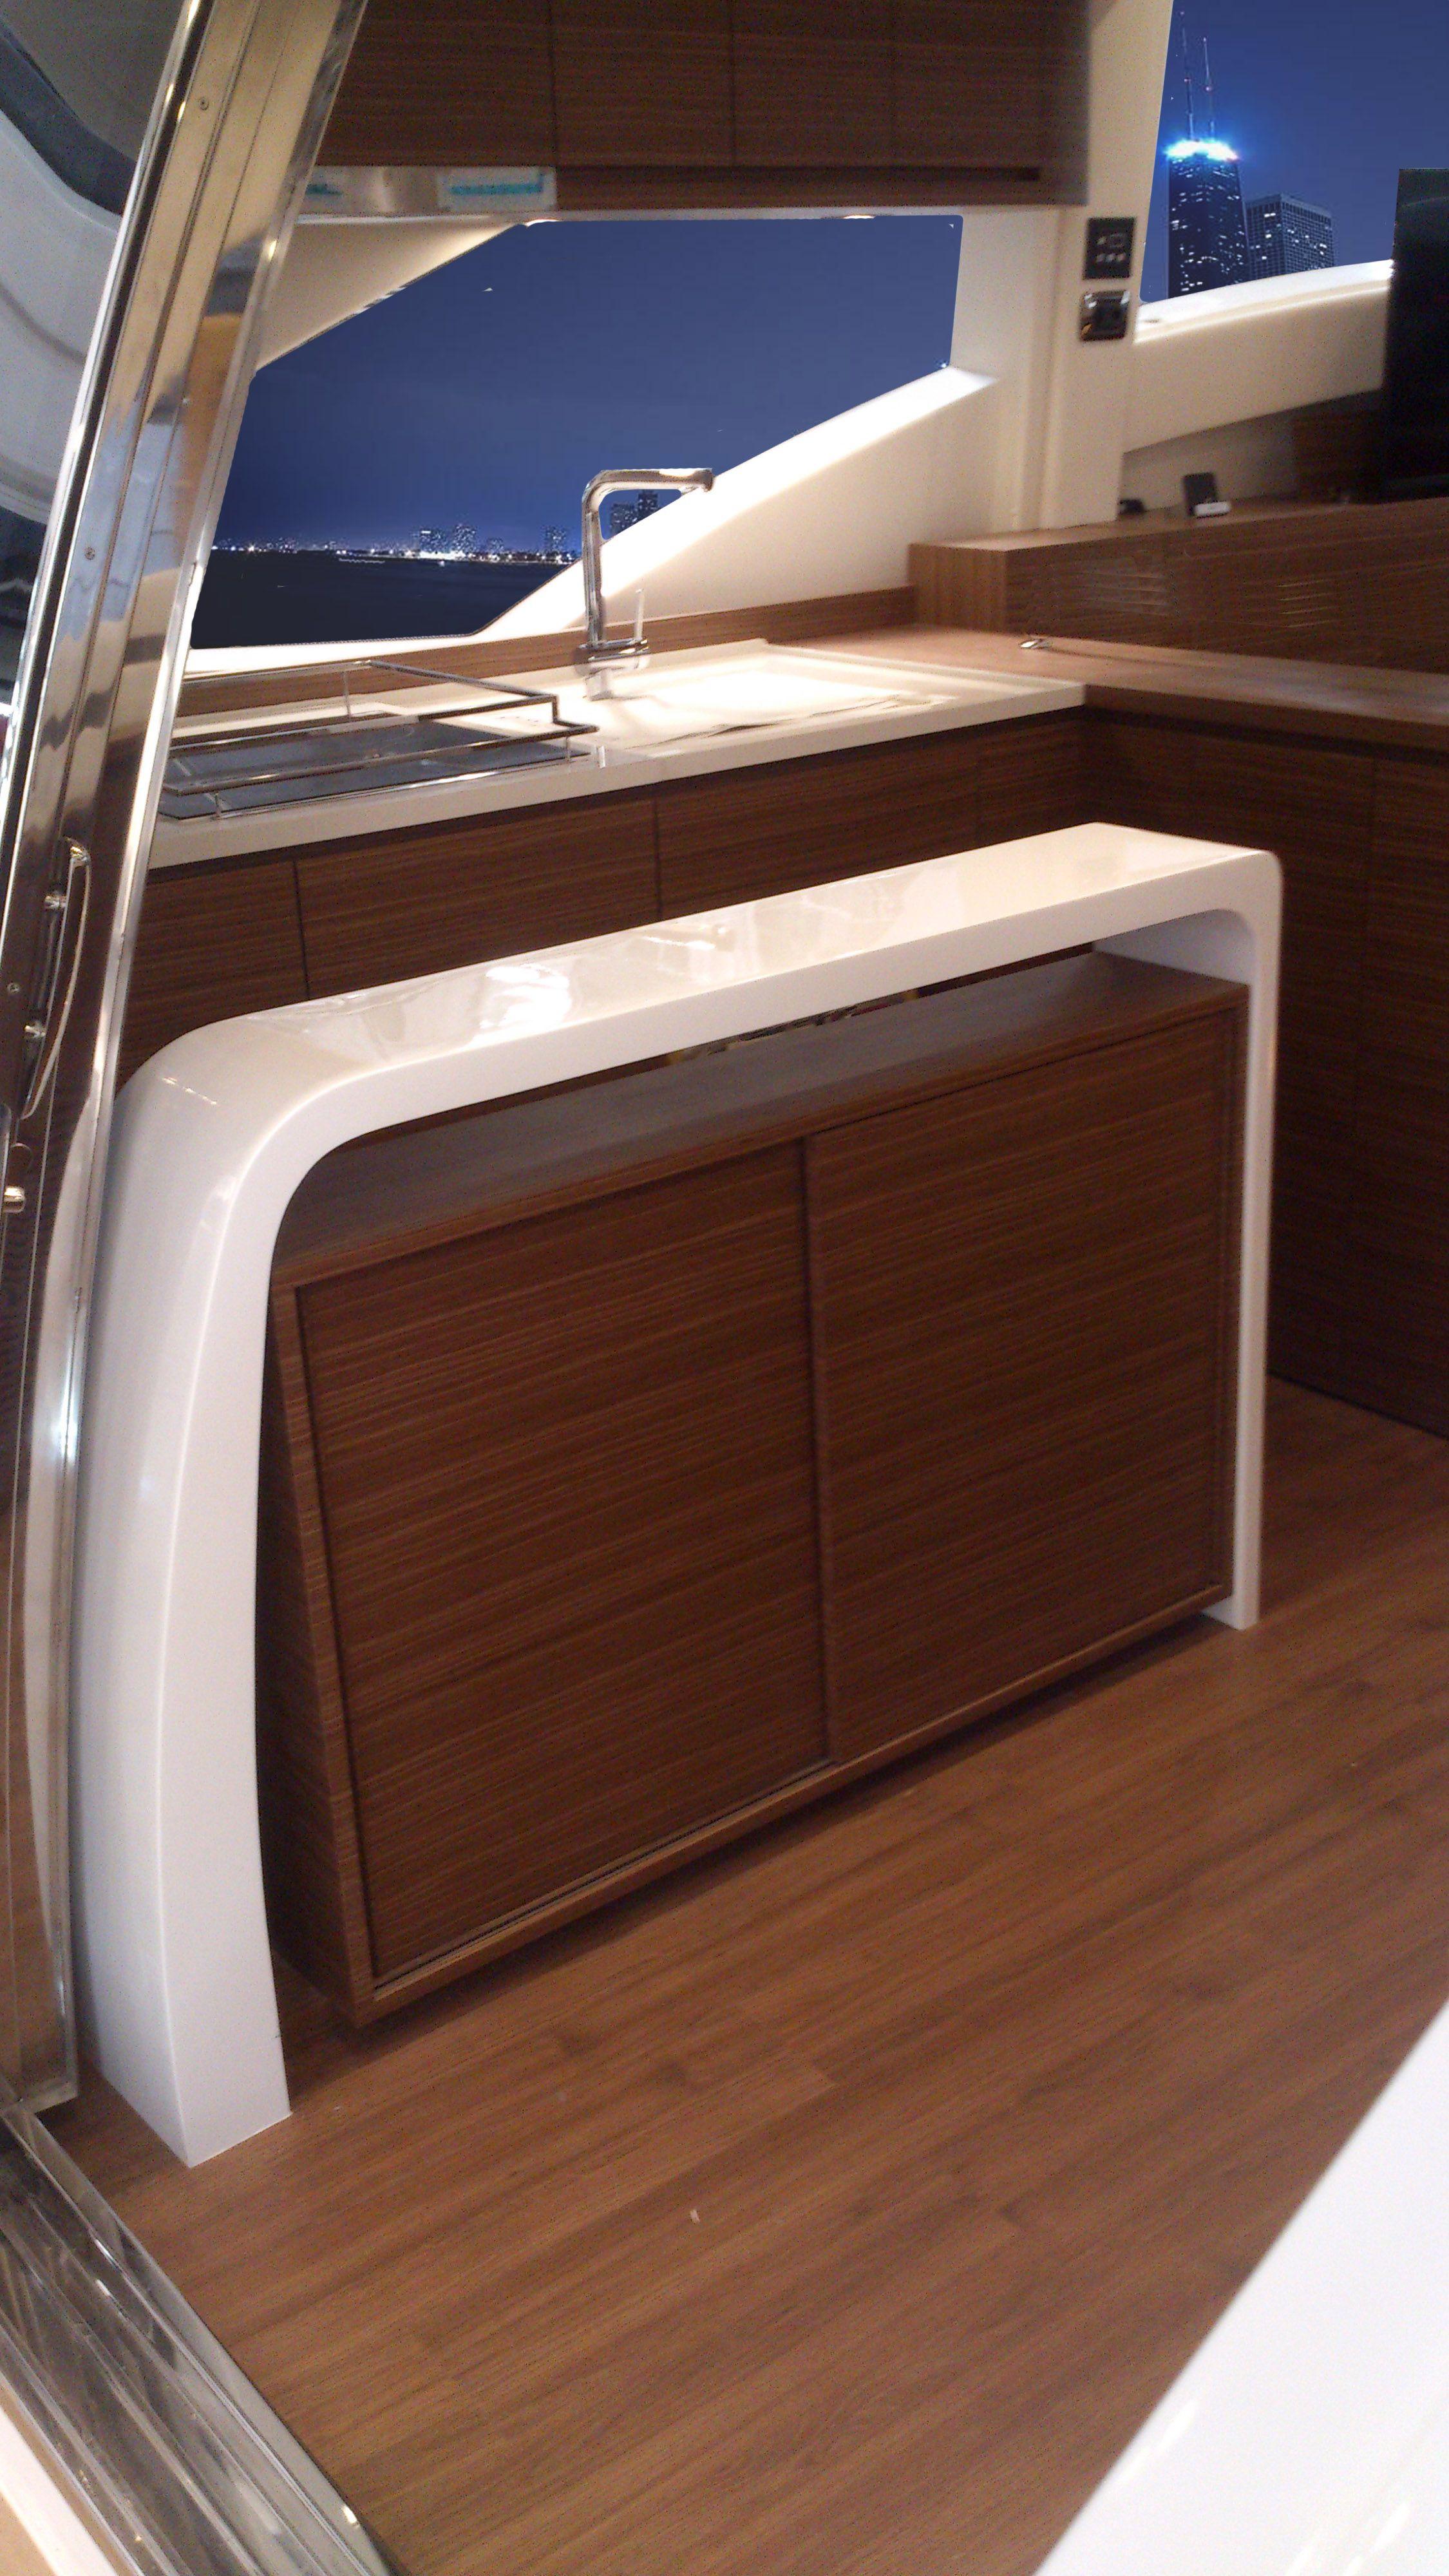 Viviane Nicoletti. Móvel Aparador para yacht de 60 pés. Contemporary Furniture for yacht.